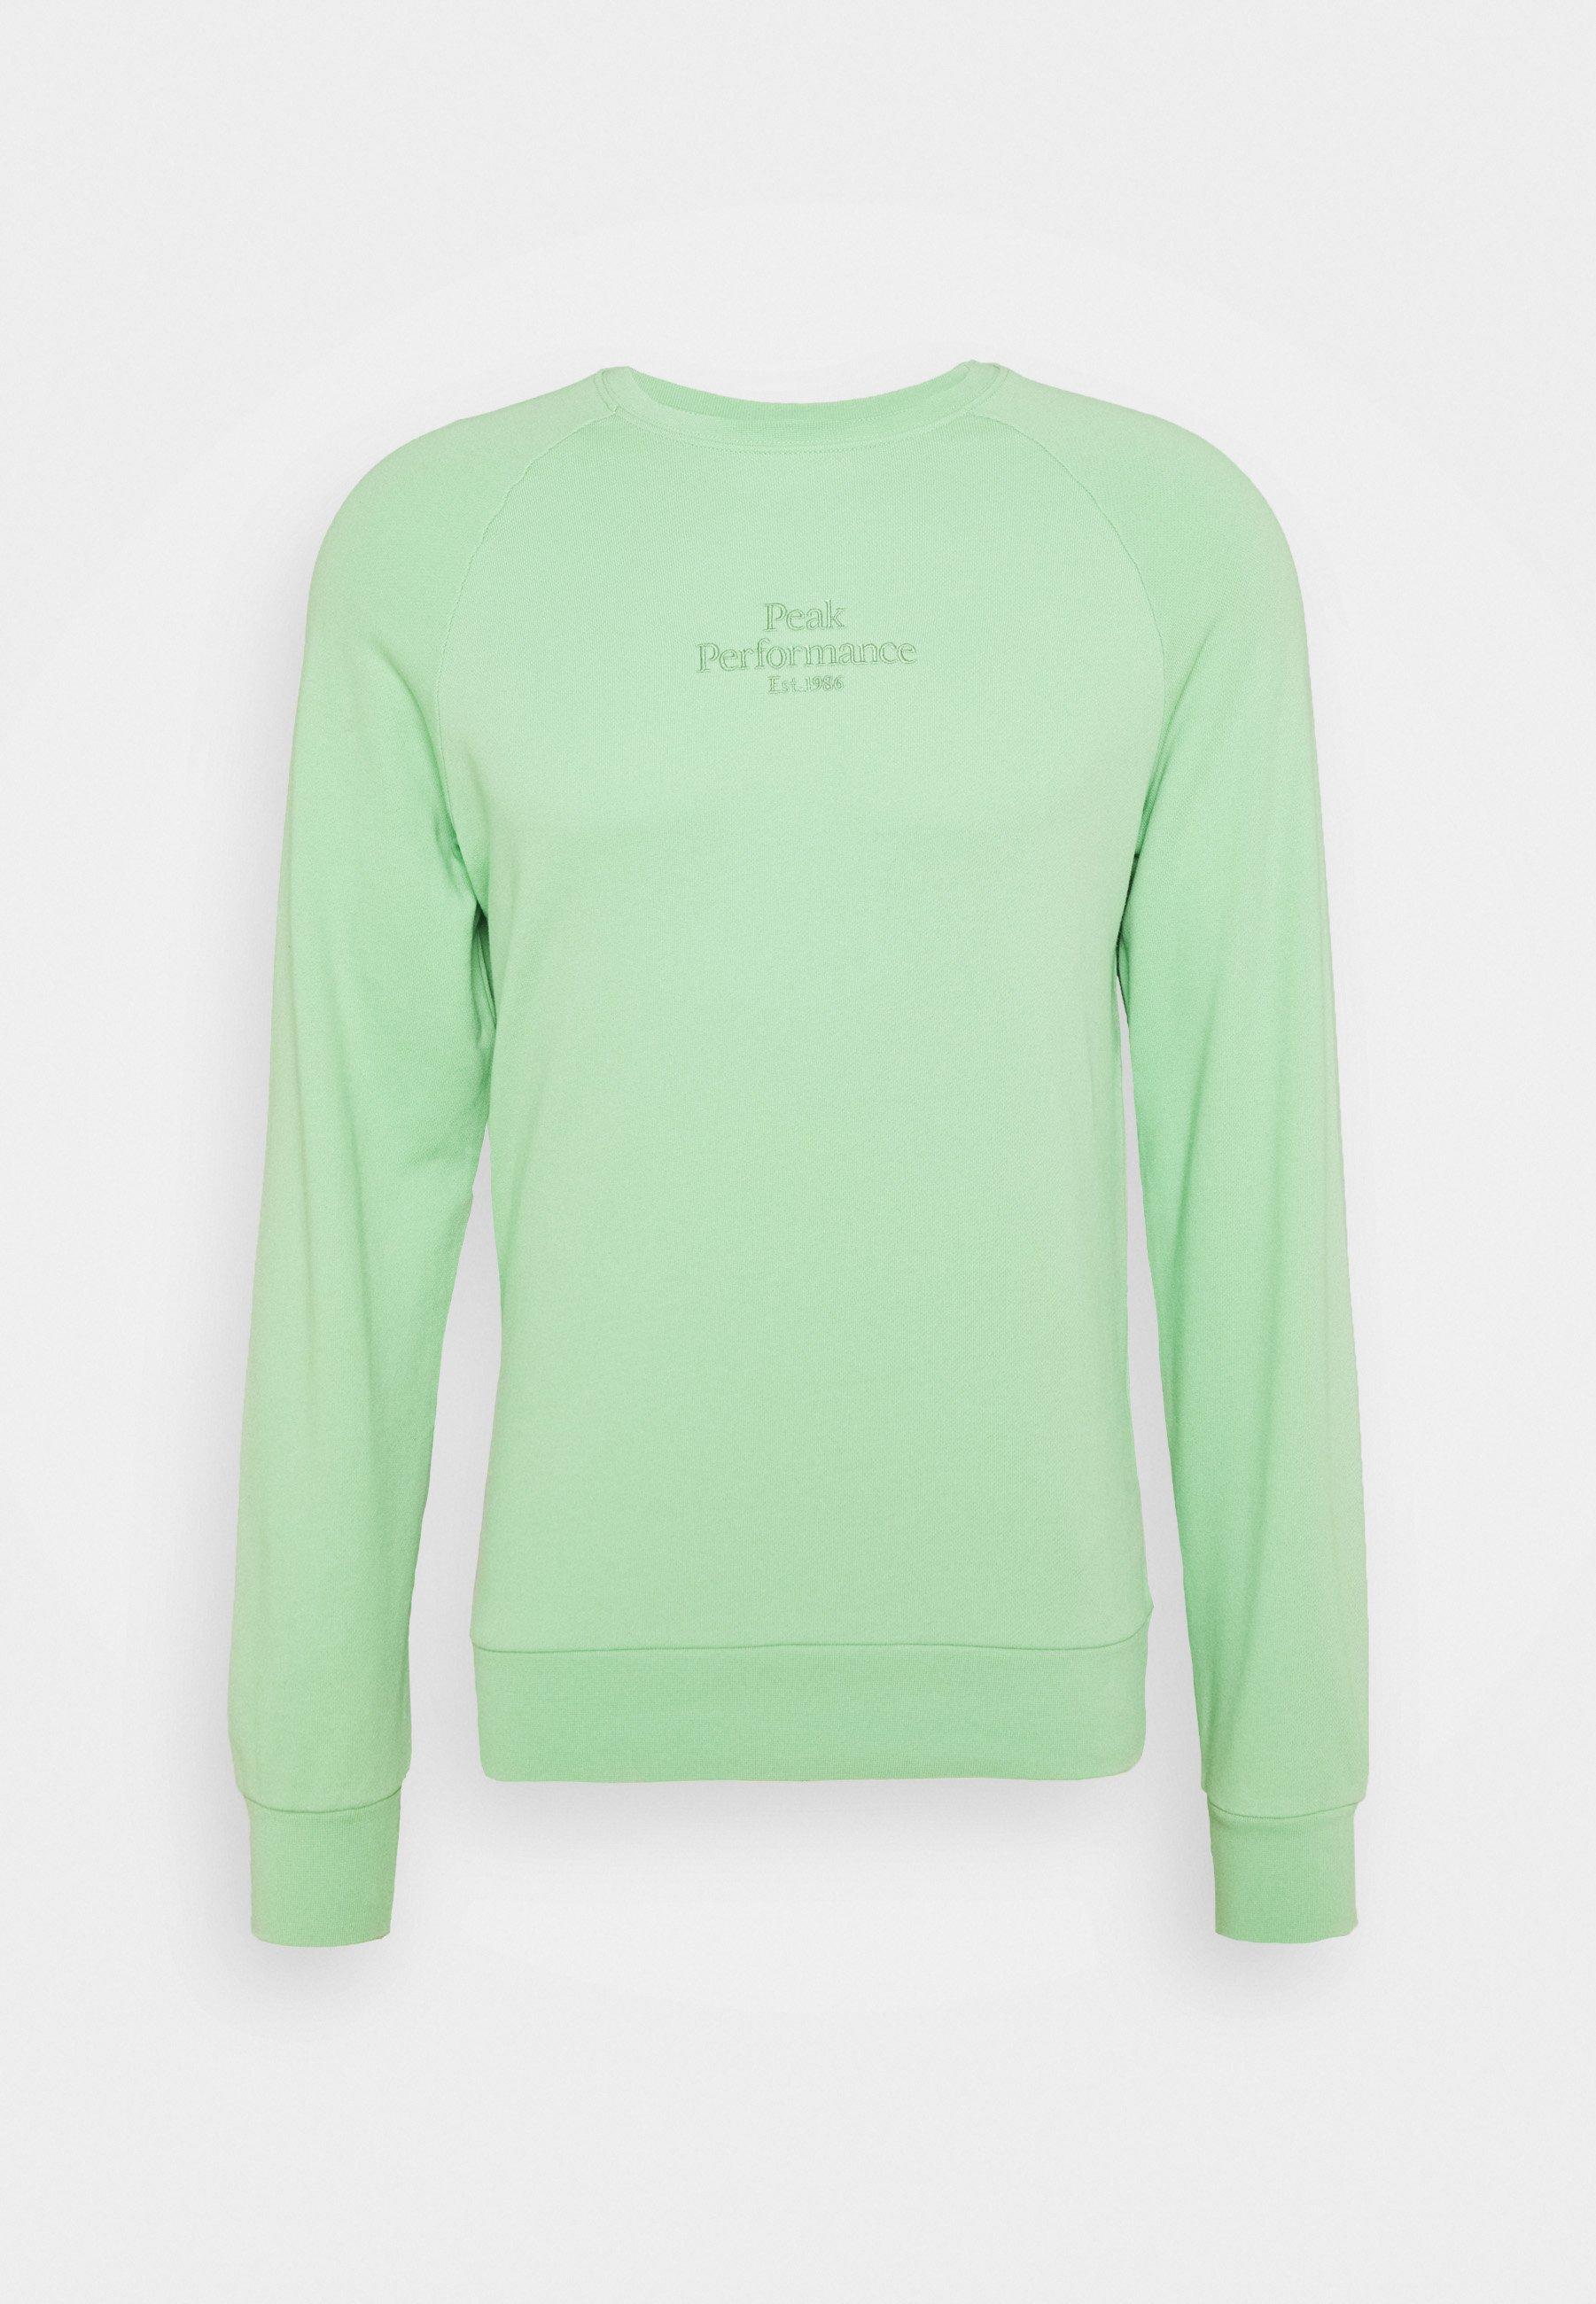 Peak Performance ORIGINAL LIGHT CREW - Sweatshirts - pale horizon